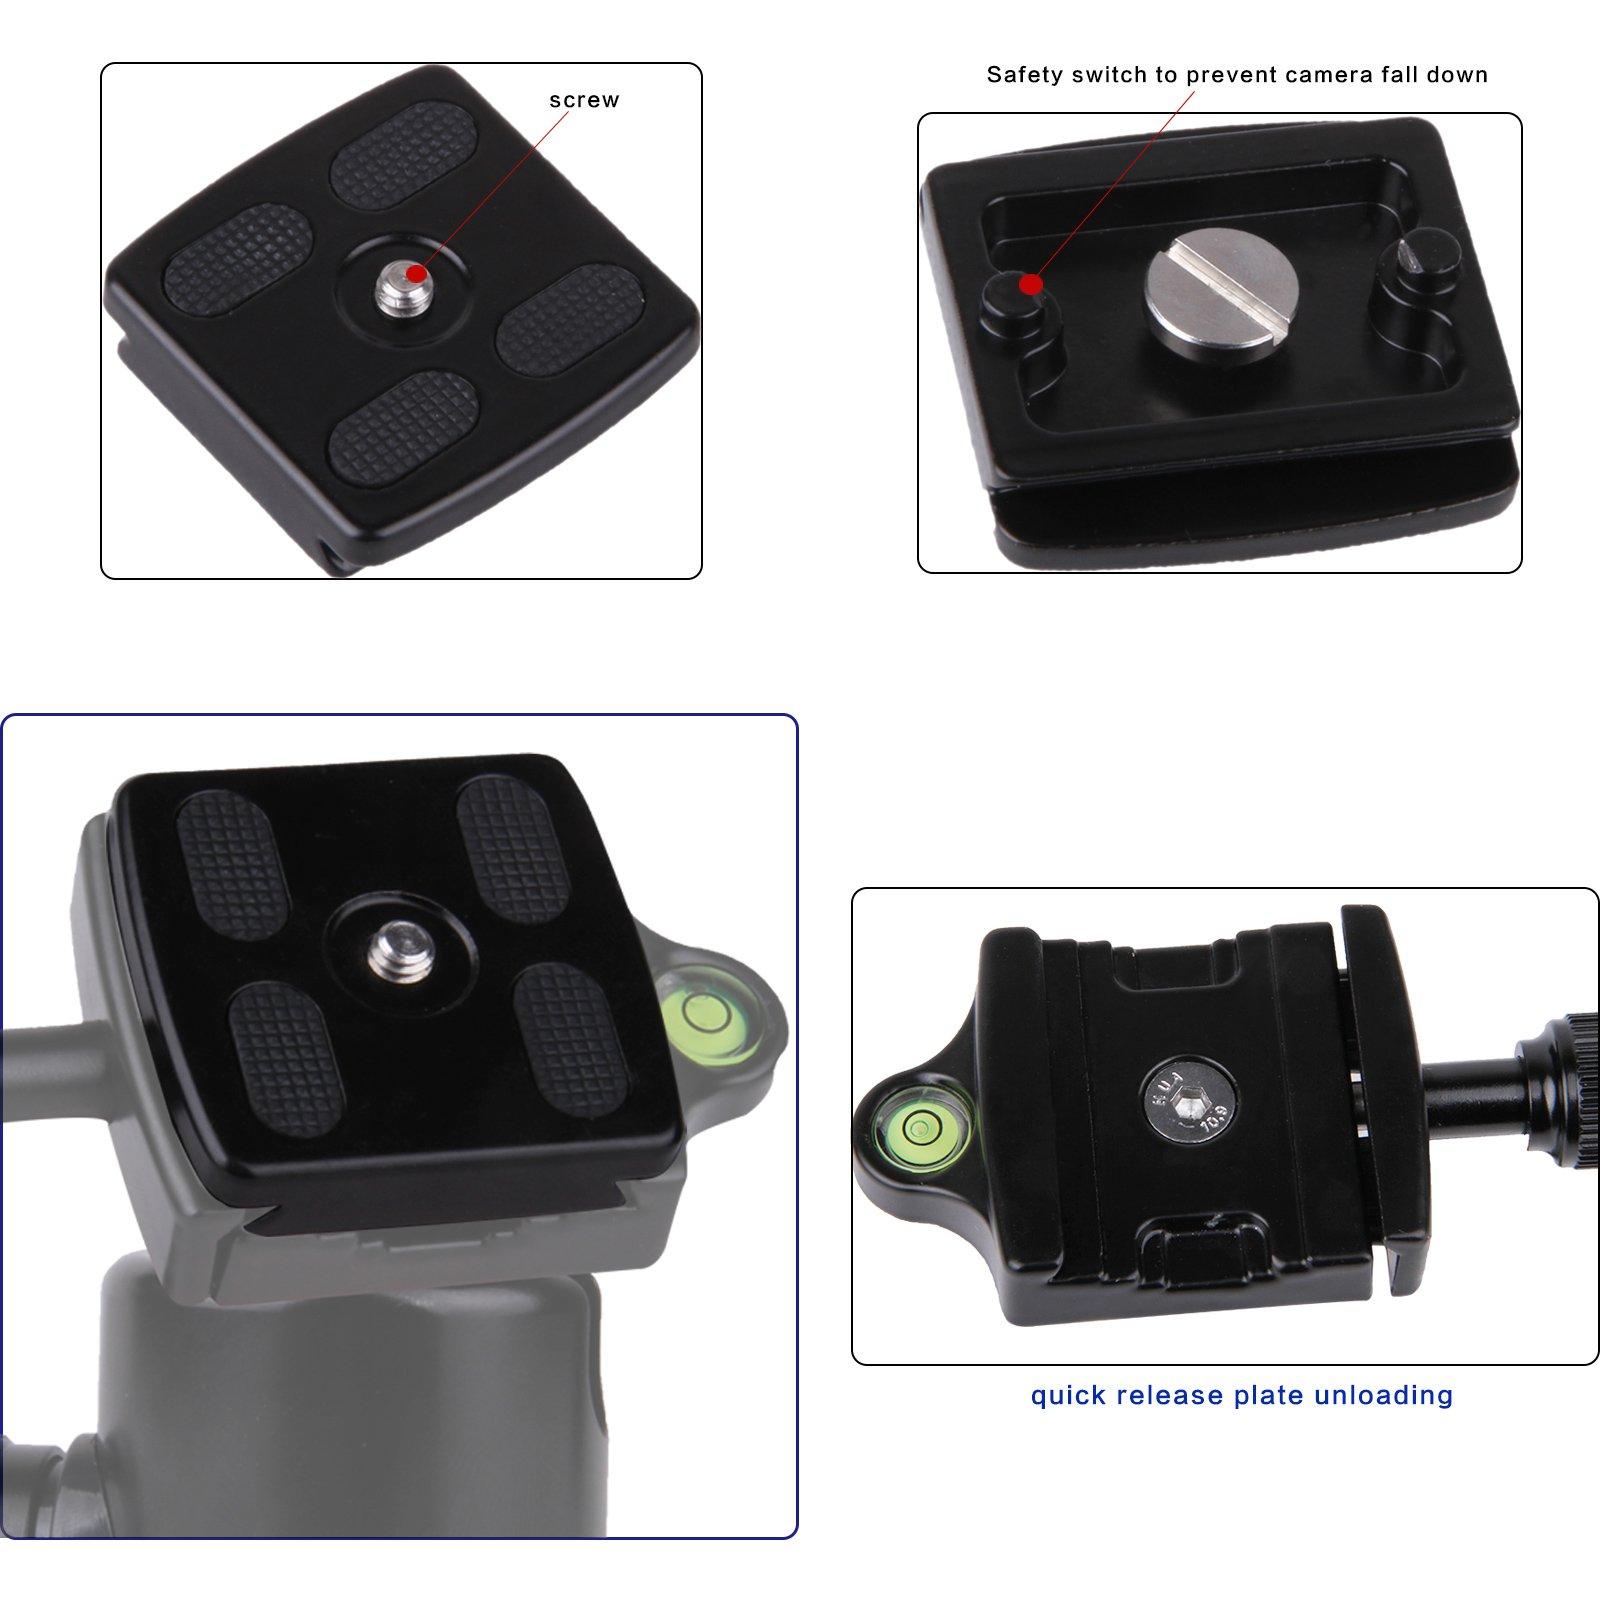 Zomei Professional Camera Camcorder Tripod Ball Head Aluminum Quick Release Applicable For Zomei Z668,Z668C,Z669,Z669C Z818,Z888,1pcs